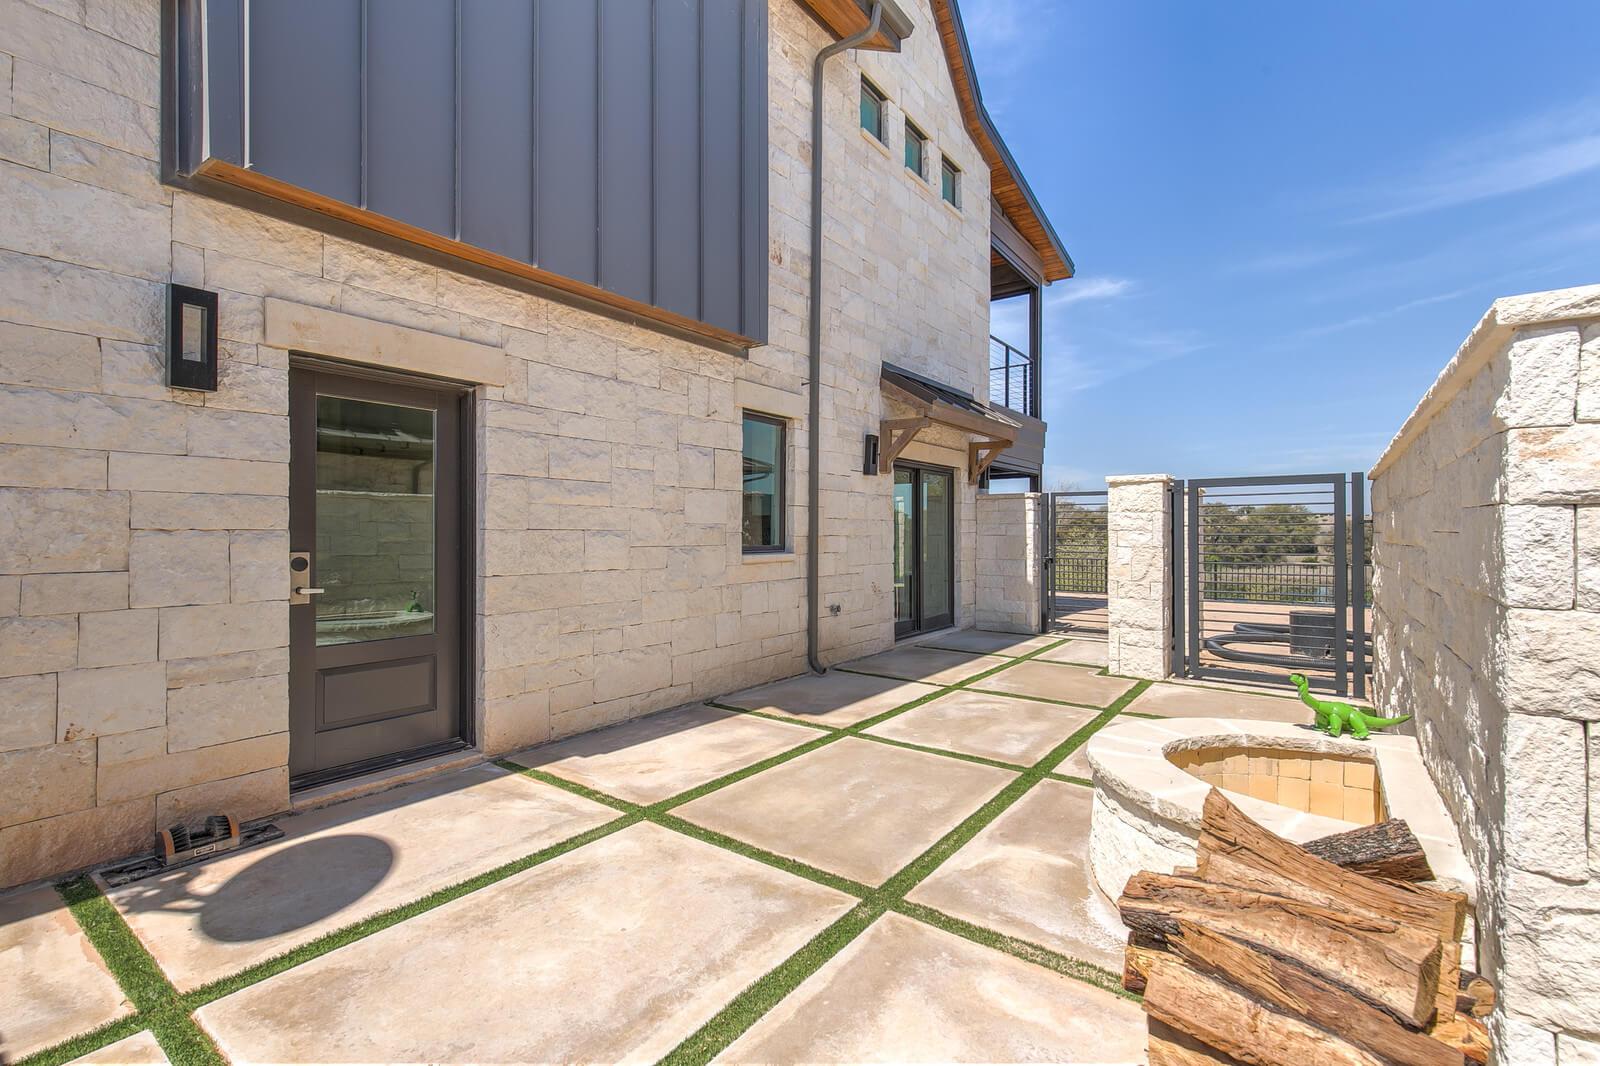 Steve-Bumpas-Custom-Homes-The-Residences-at-Rough-Creek-Lodge-Beck-101.jpg